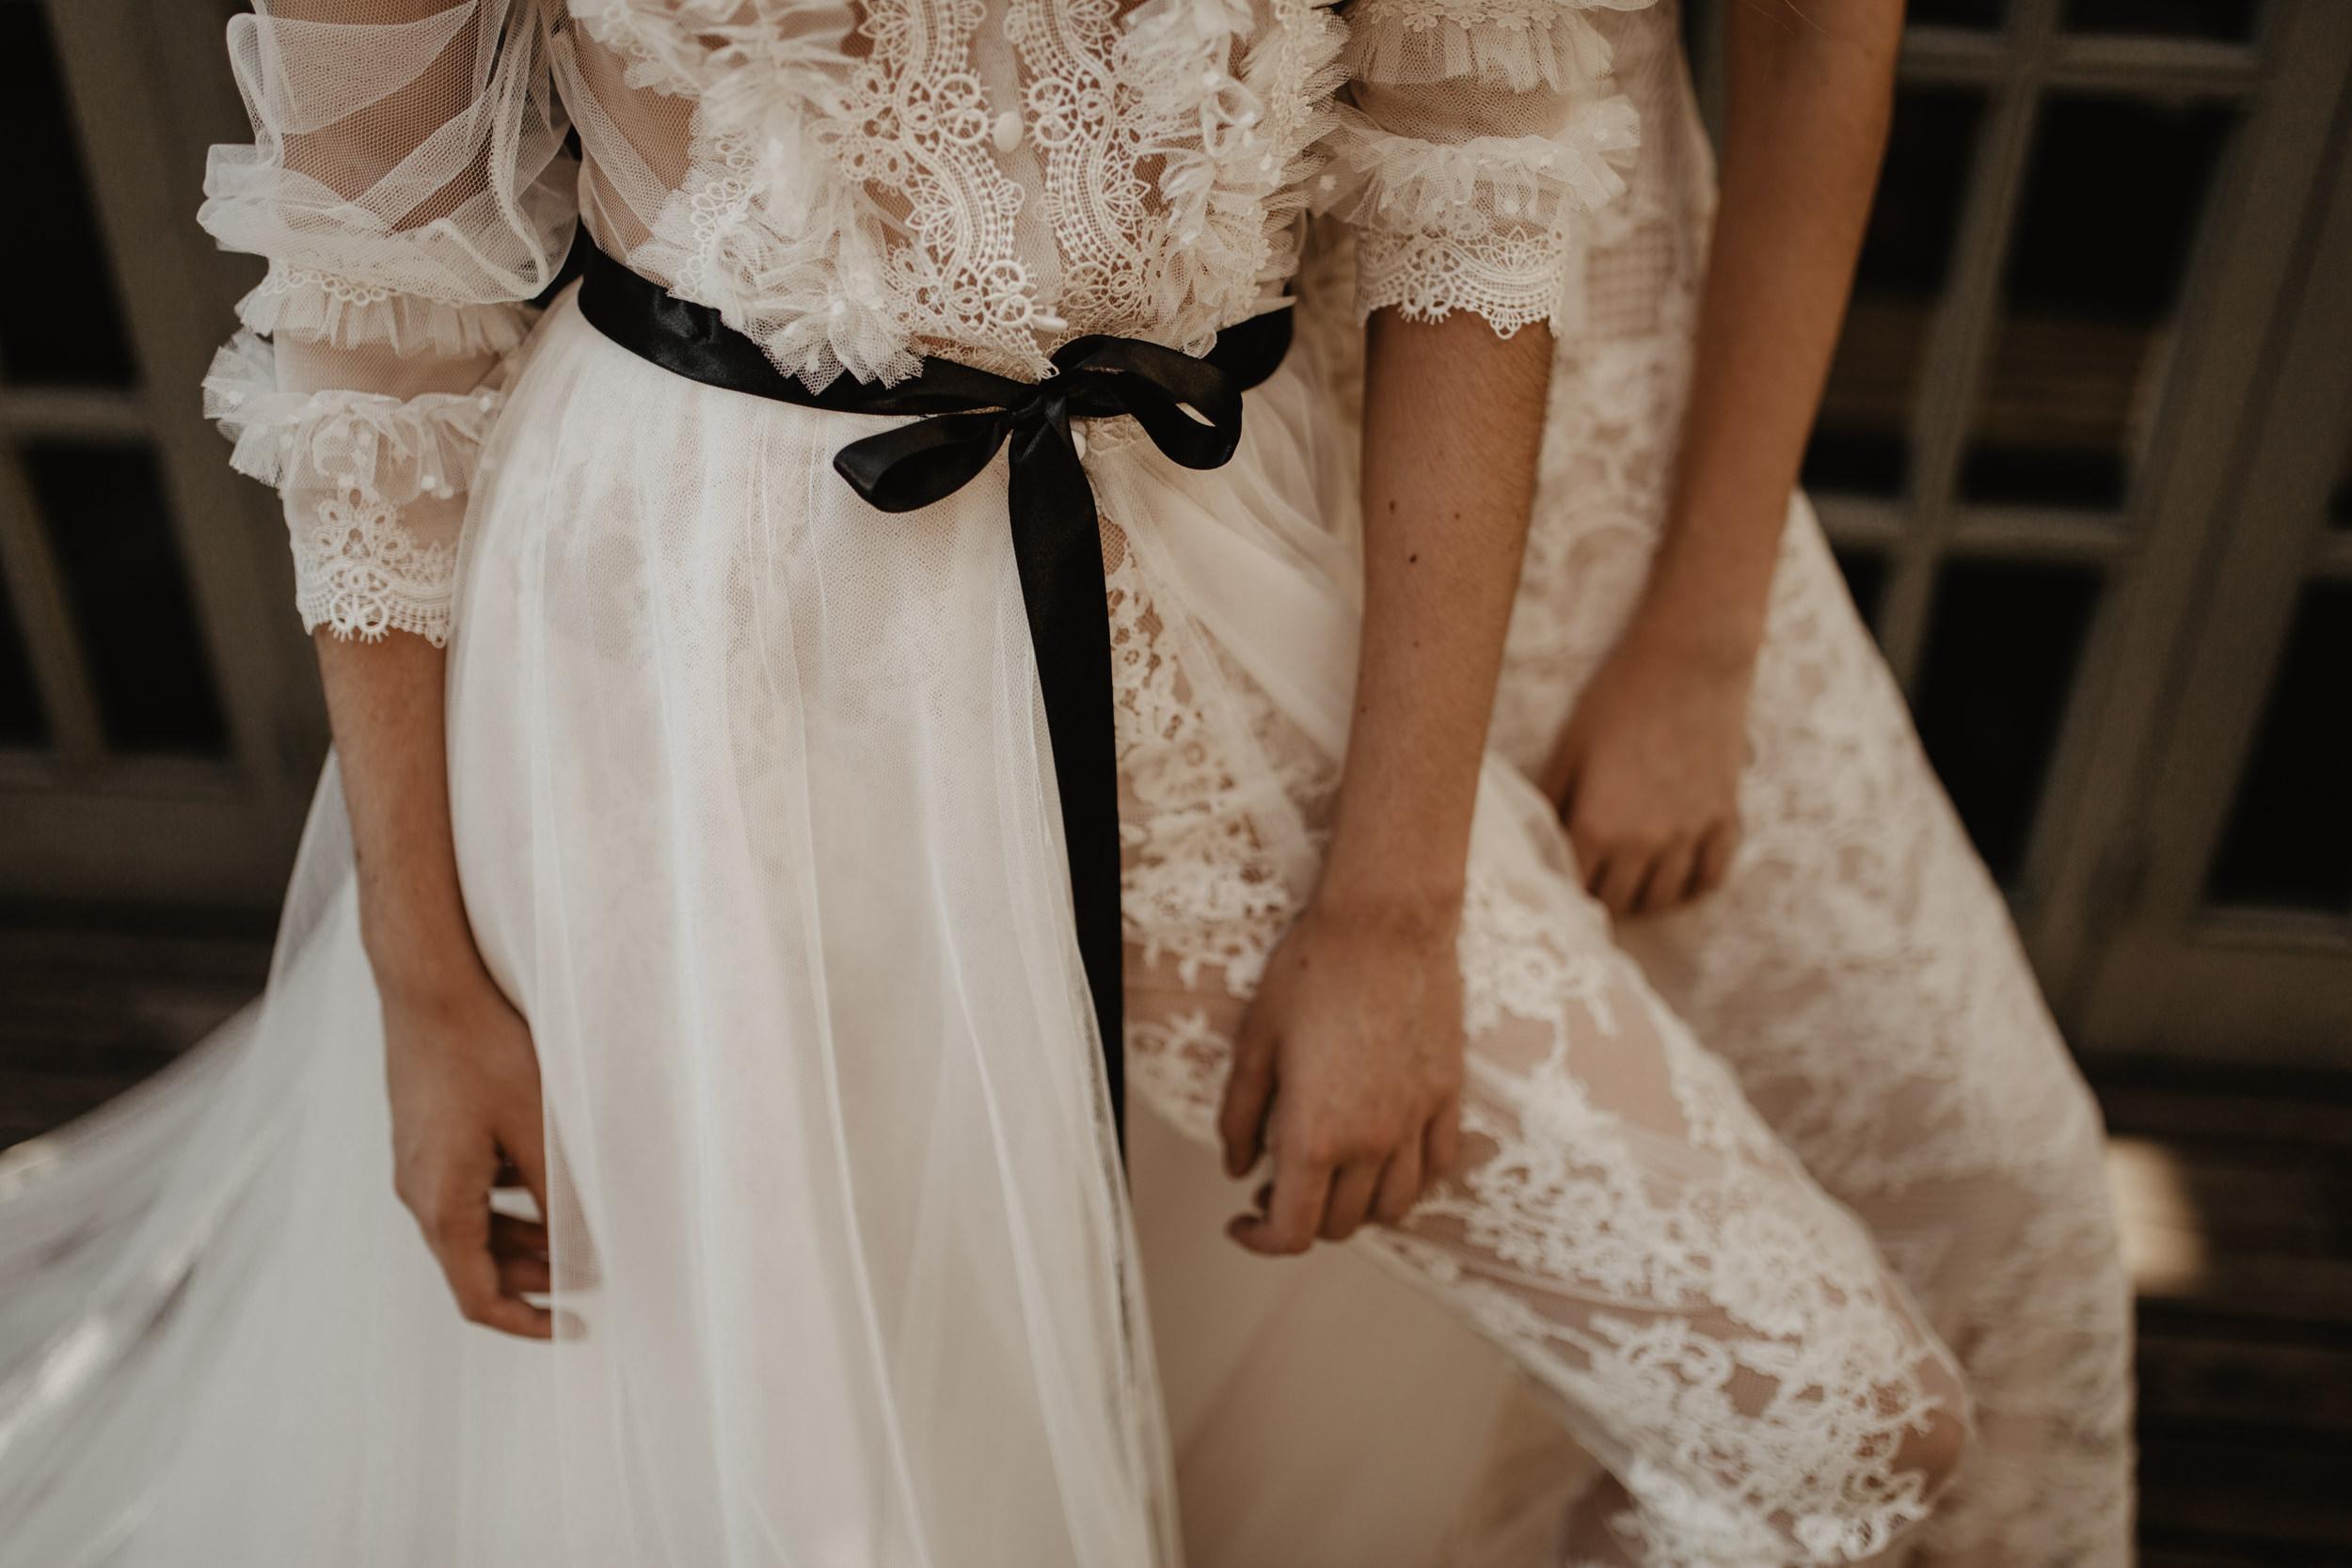 thenortherngirlphotography_photography_thenortherngirl_rebeccascabros_wedding_weddingphotography_weddingphotographer_barcelona_fashionbarcelona_unconventionalwedding_lacasademuñecas-171.jpg